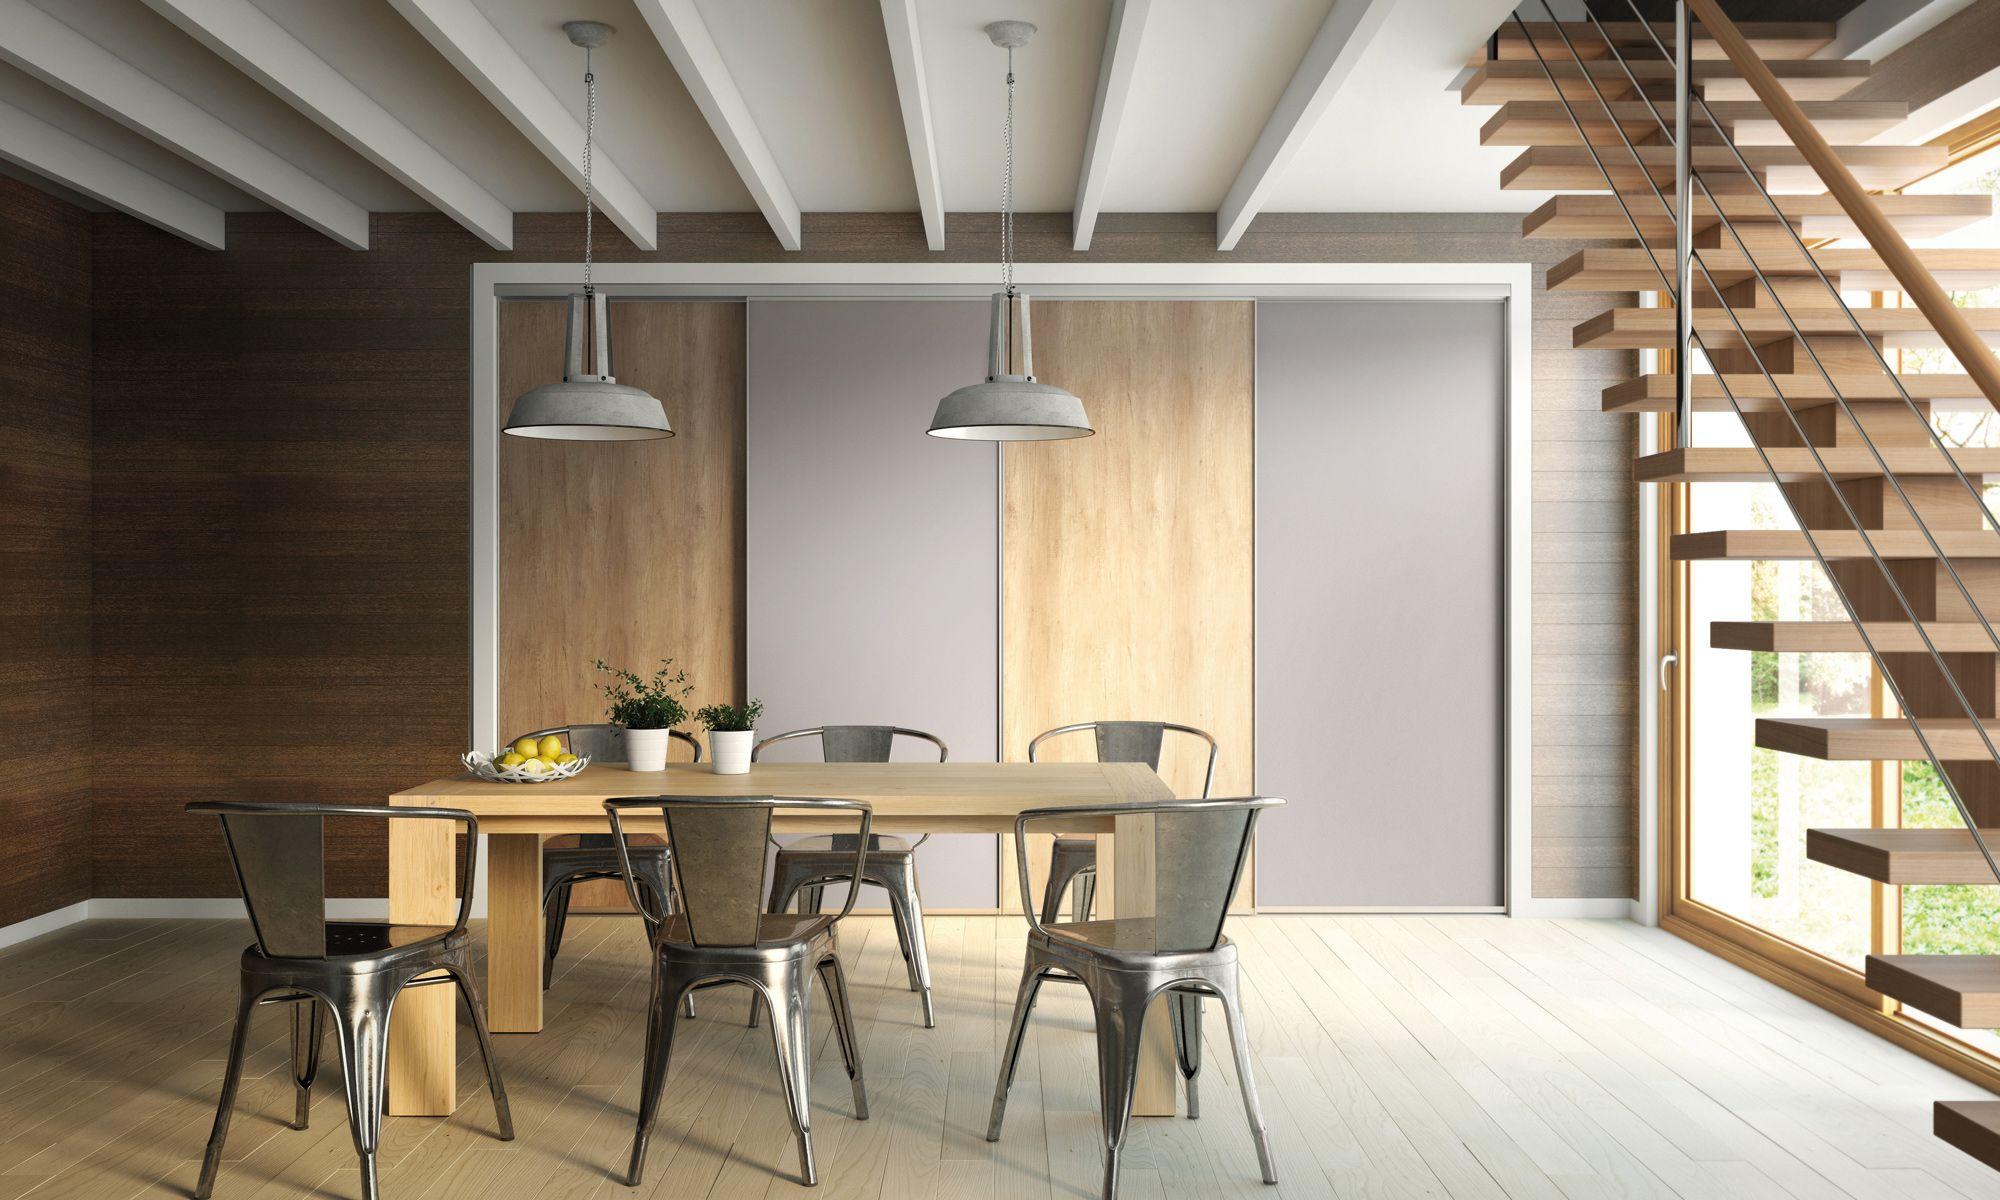 sogal s jour salle manger placard coulissant mod le. Black Bedroom Furniture Sets. Home Design Ideas